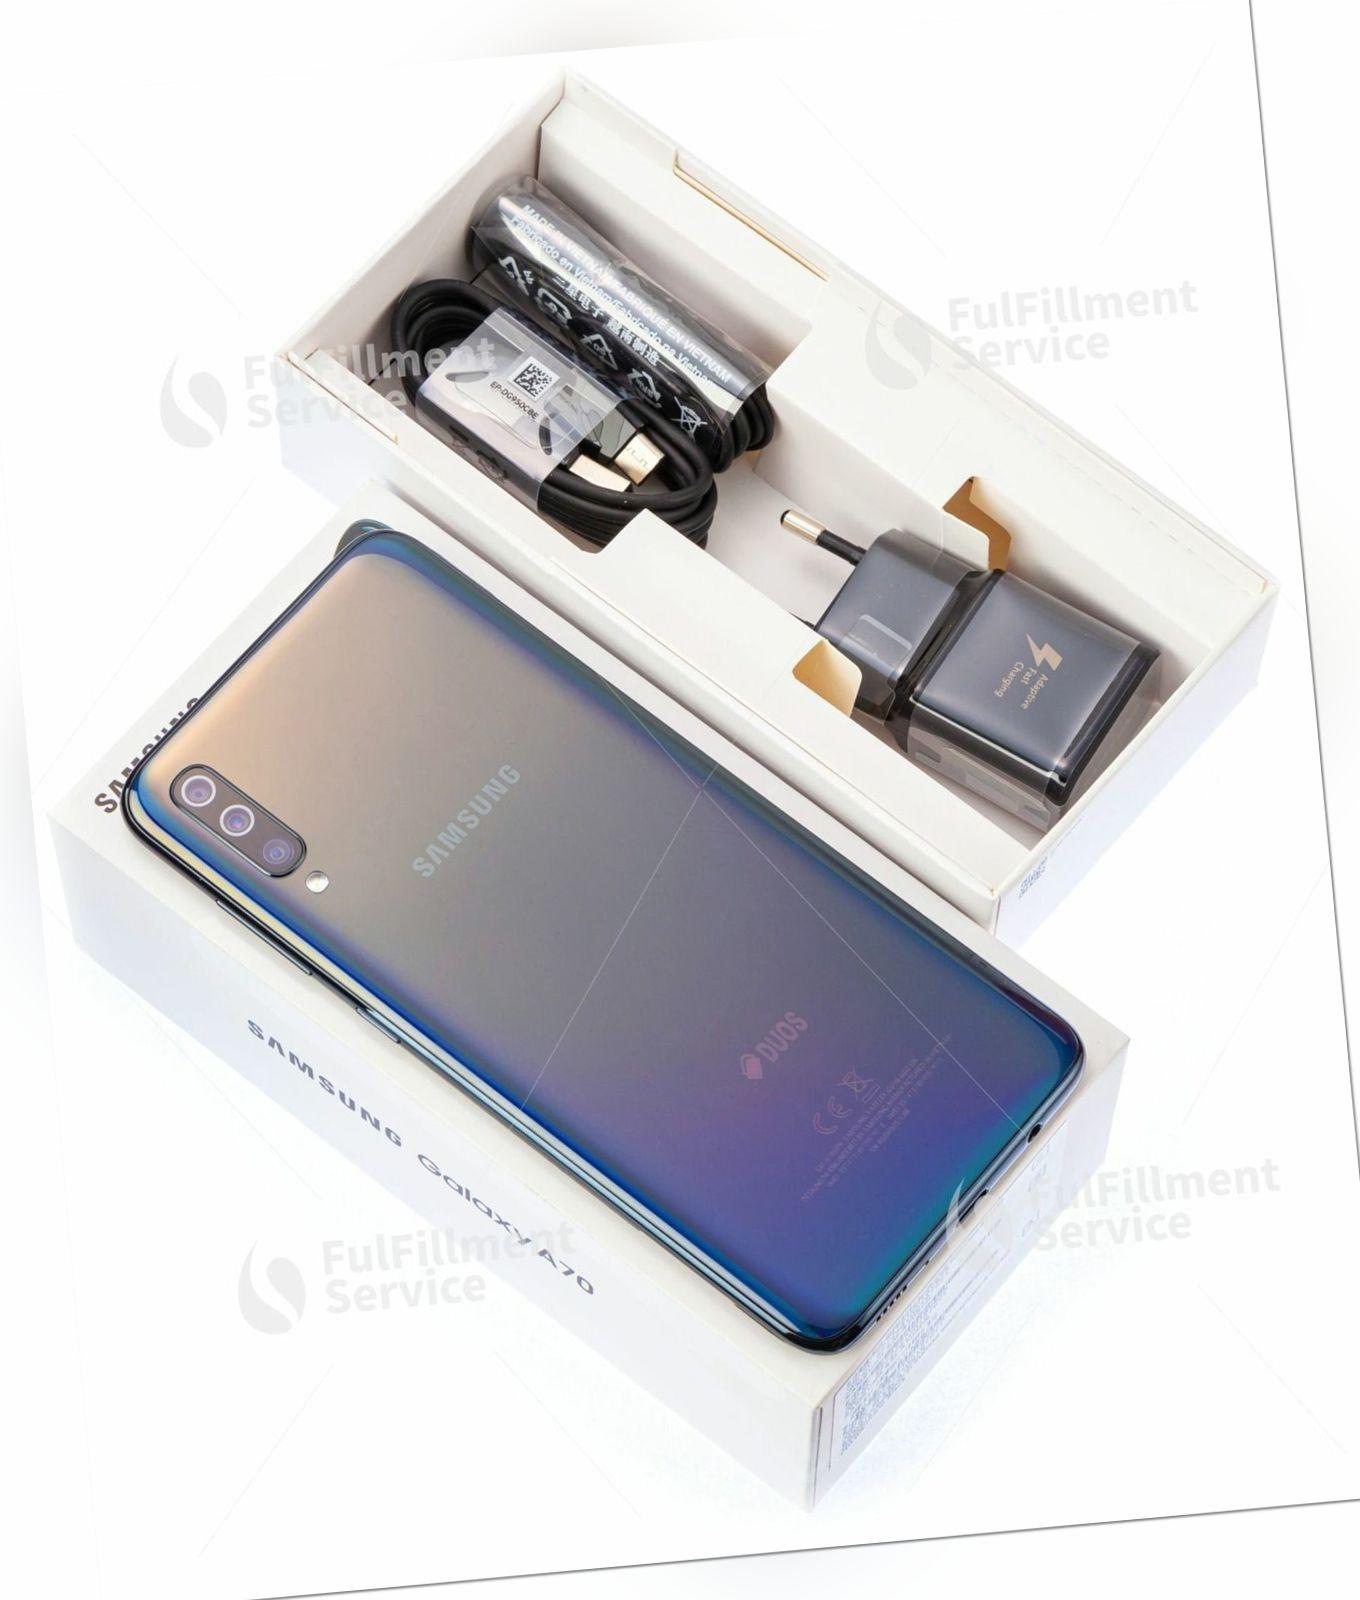 Samsung  Galaxy A70 A705fn Smartphone Handy Android 8 MP Kamera...